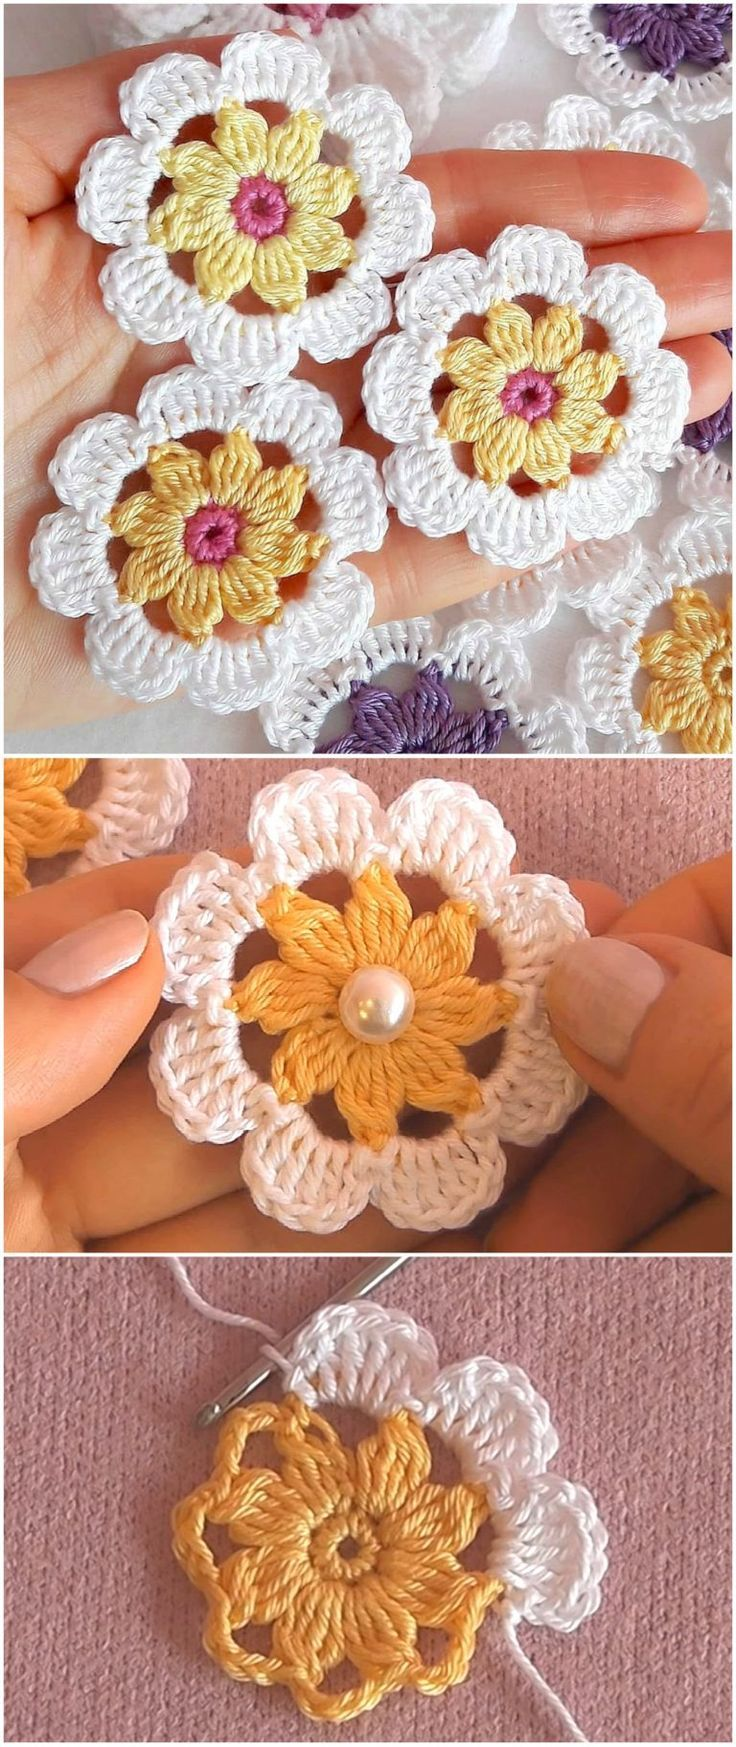 Häkelblumenmuster für Anfänger – Yarnandhooks - Fitness #crochetflowerpatterns